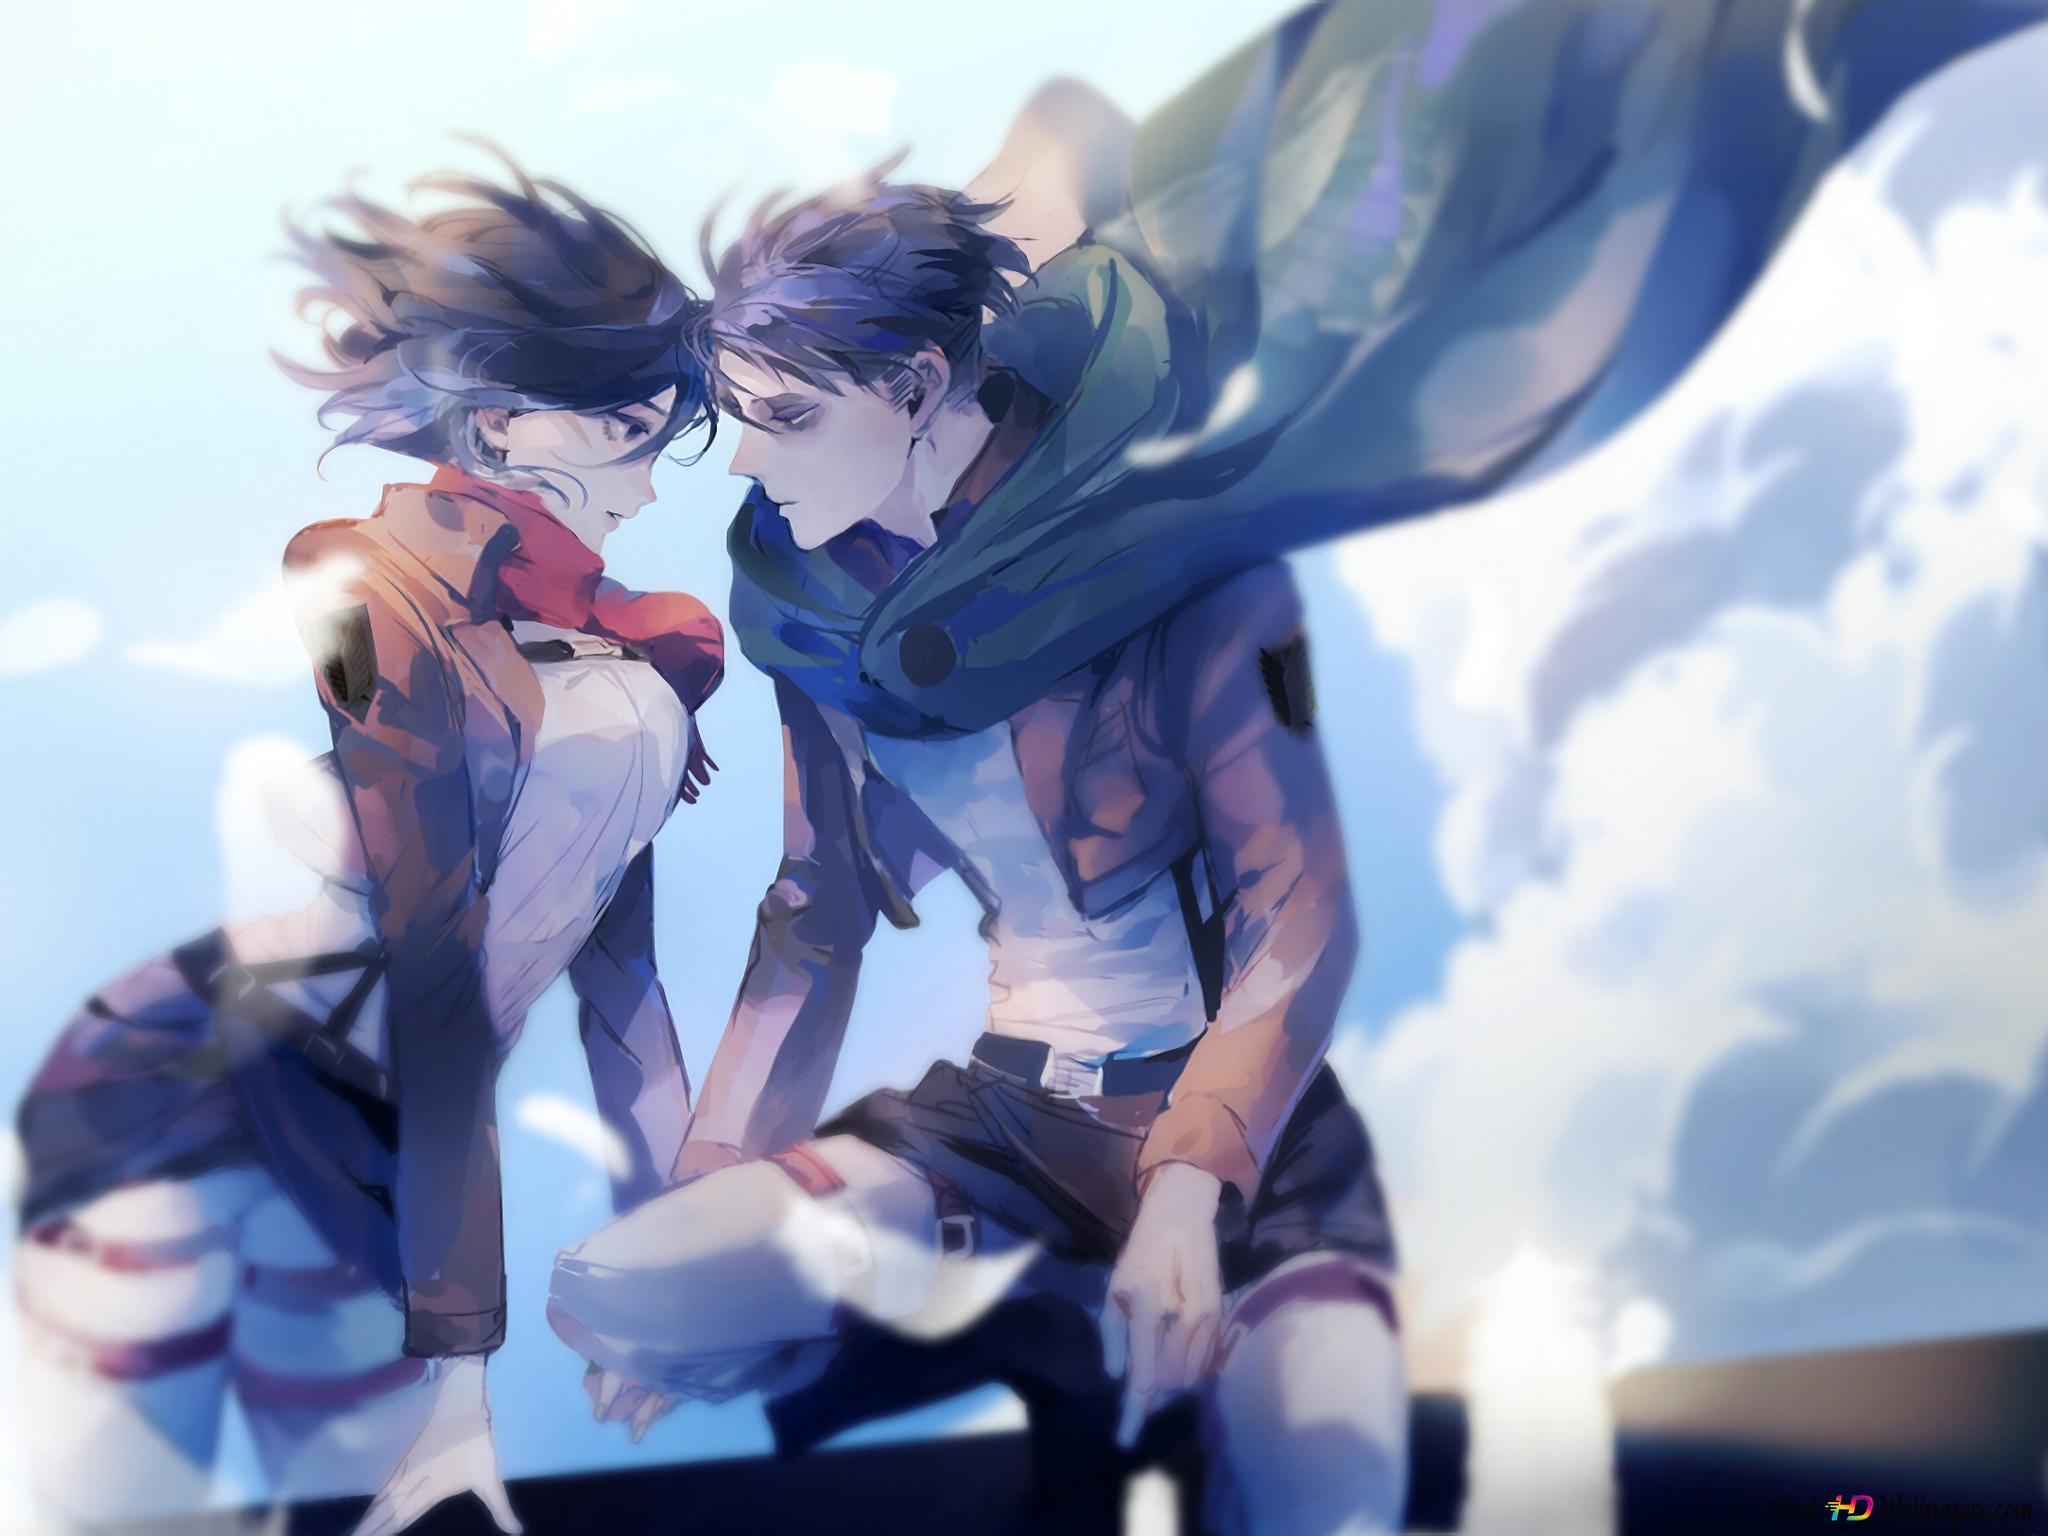 Anime Attack On Titan Hd Wallpaper Download